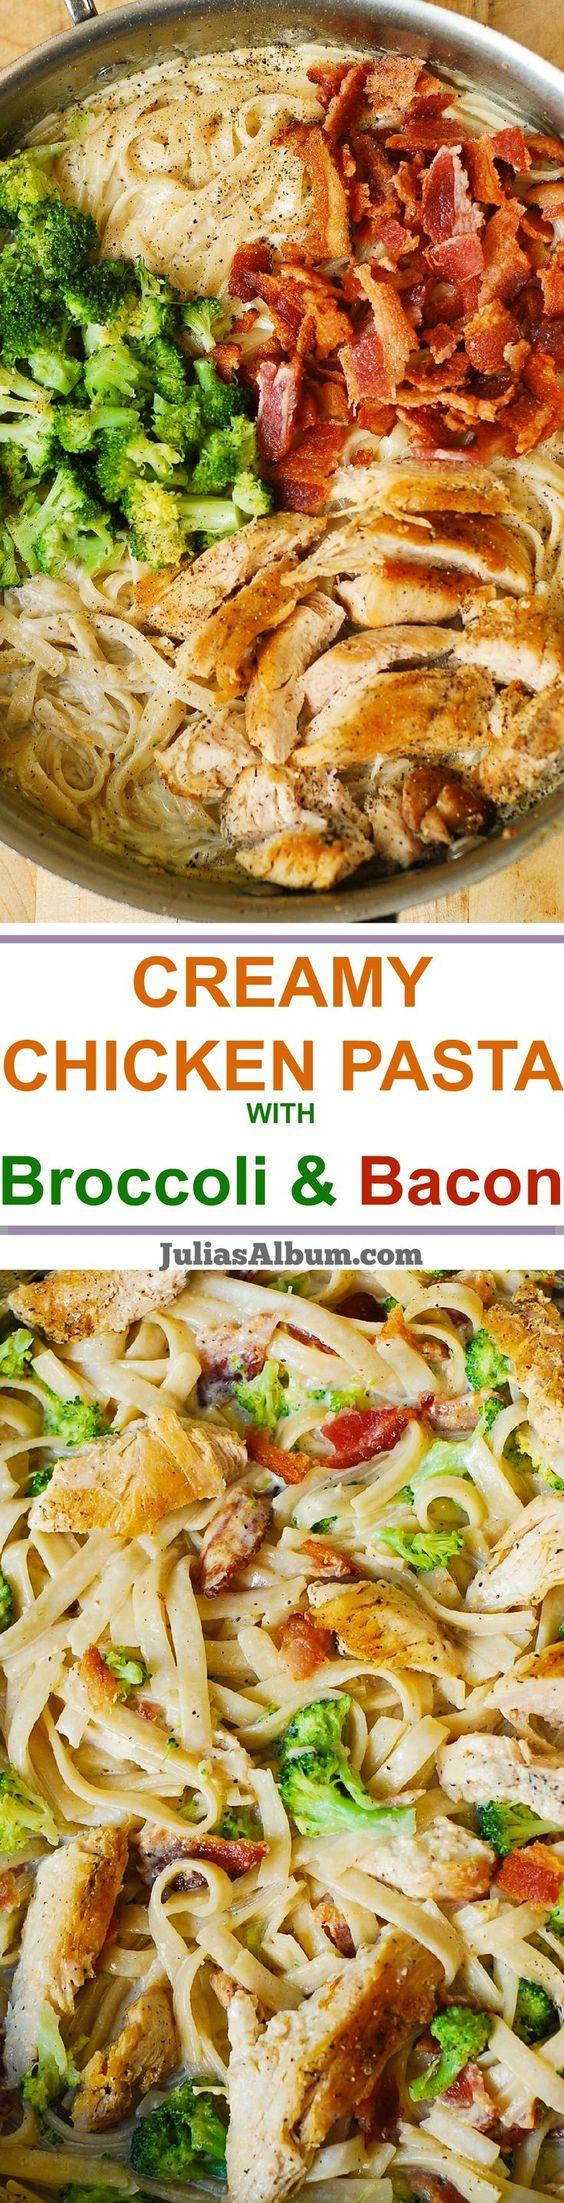 Broccoli chicken, Fettuccine pasta and Homemade alfredo on Pinterest